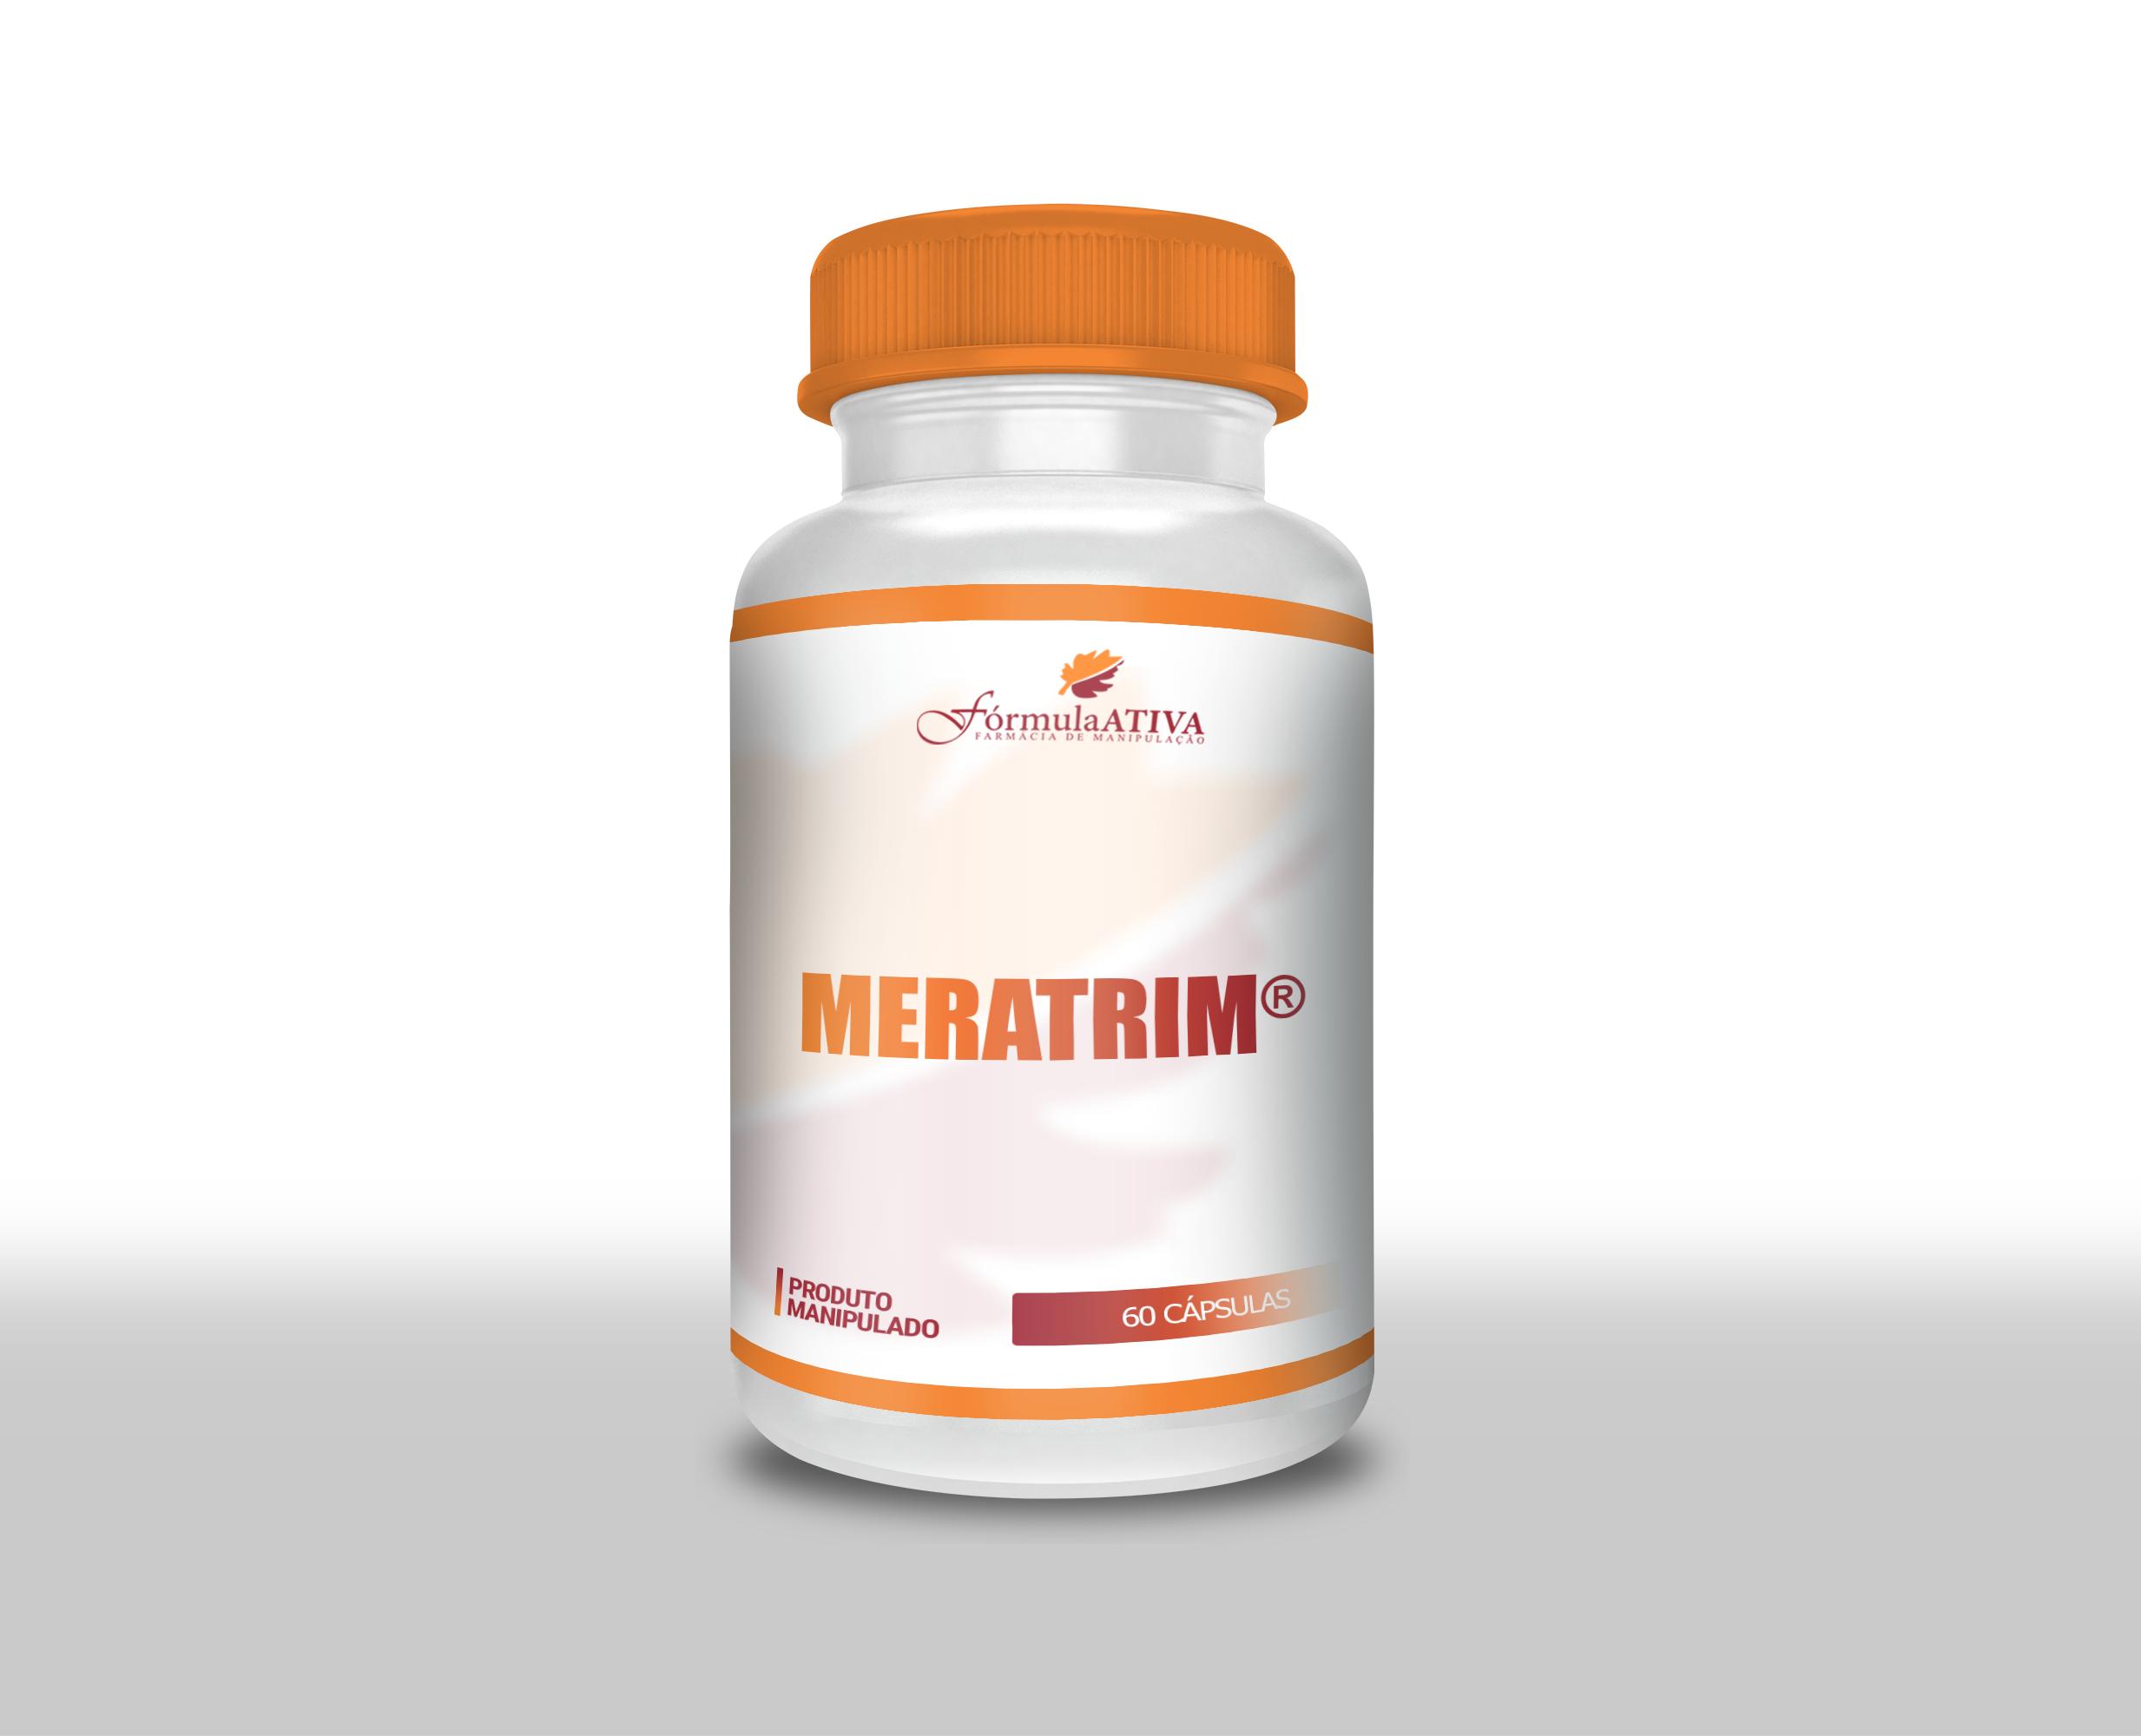 Meratrim (400mg - 60 doses)